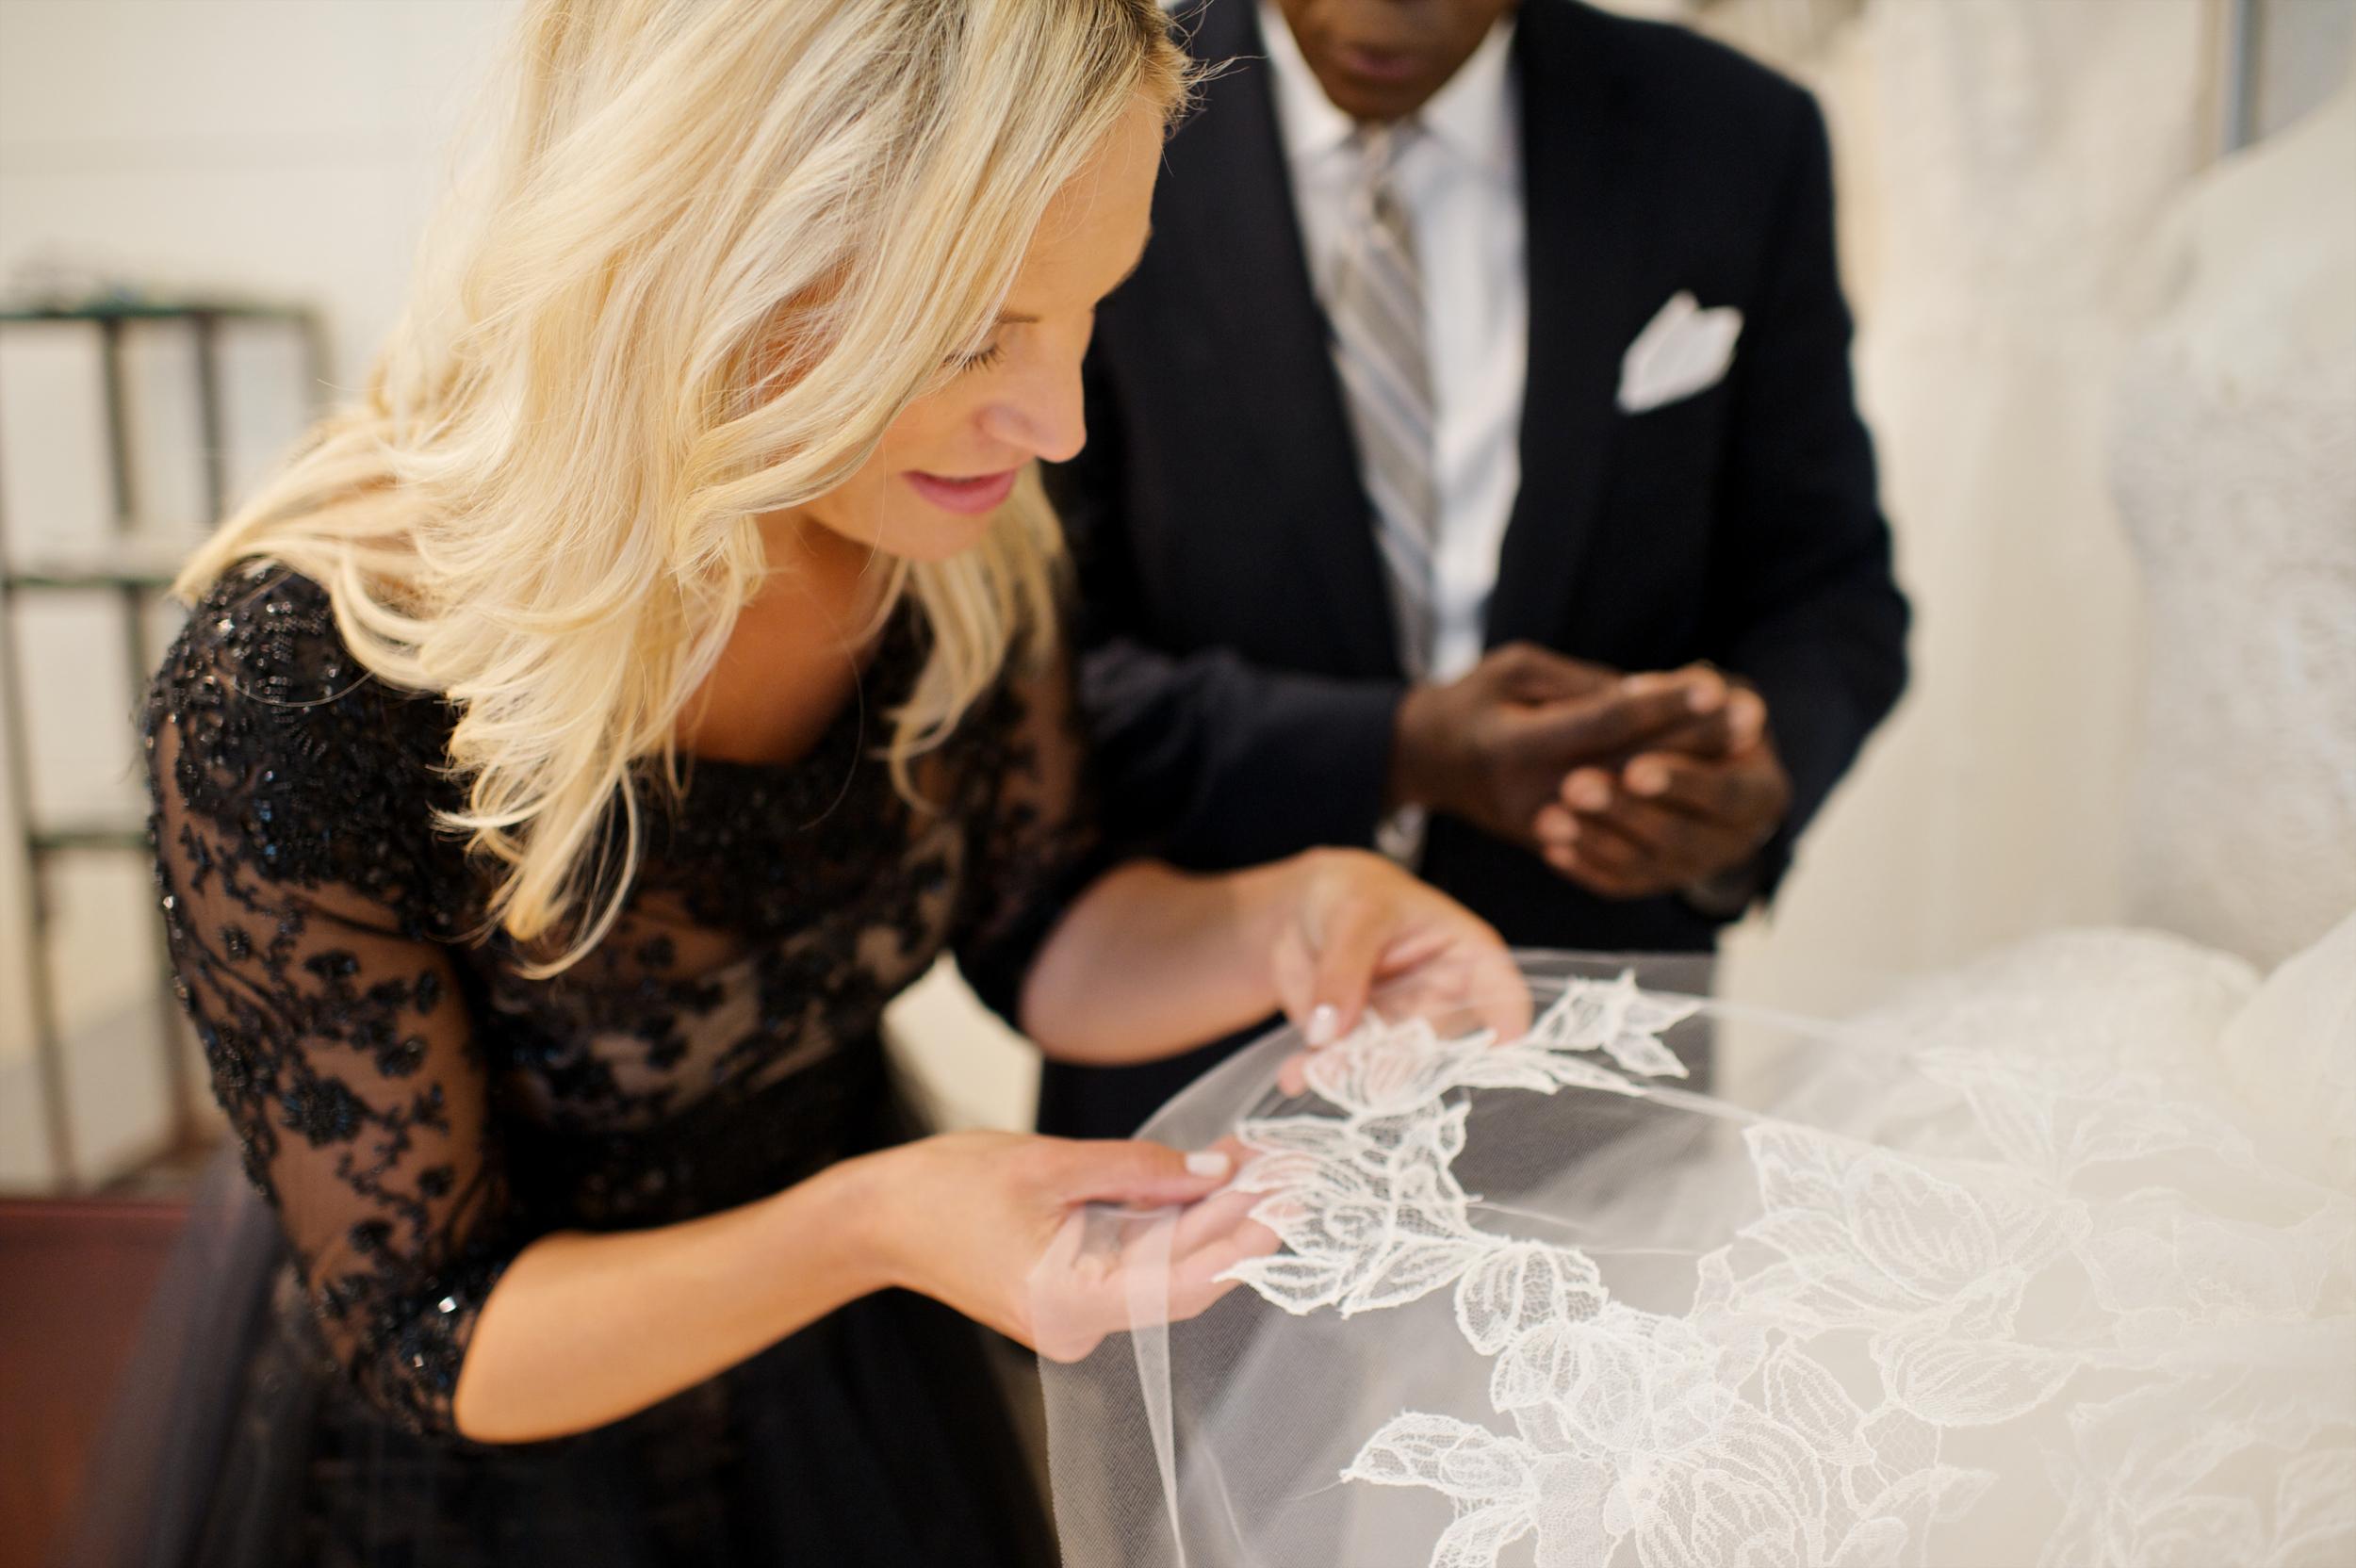 Ceci_New_York_Ceci_Style_Ceci_Johnson_Luxury_Lifestyle_Floral_Lace_Wedding_Letterpress_Inspiration_Design_Custom_Couture_Personalized_Invitations_1.jpg